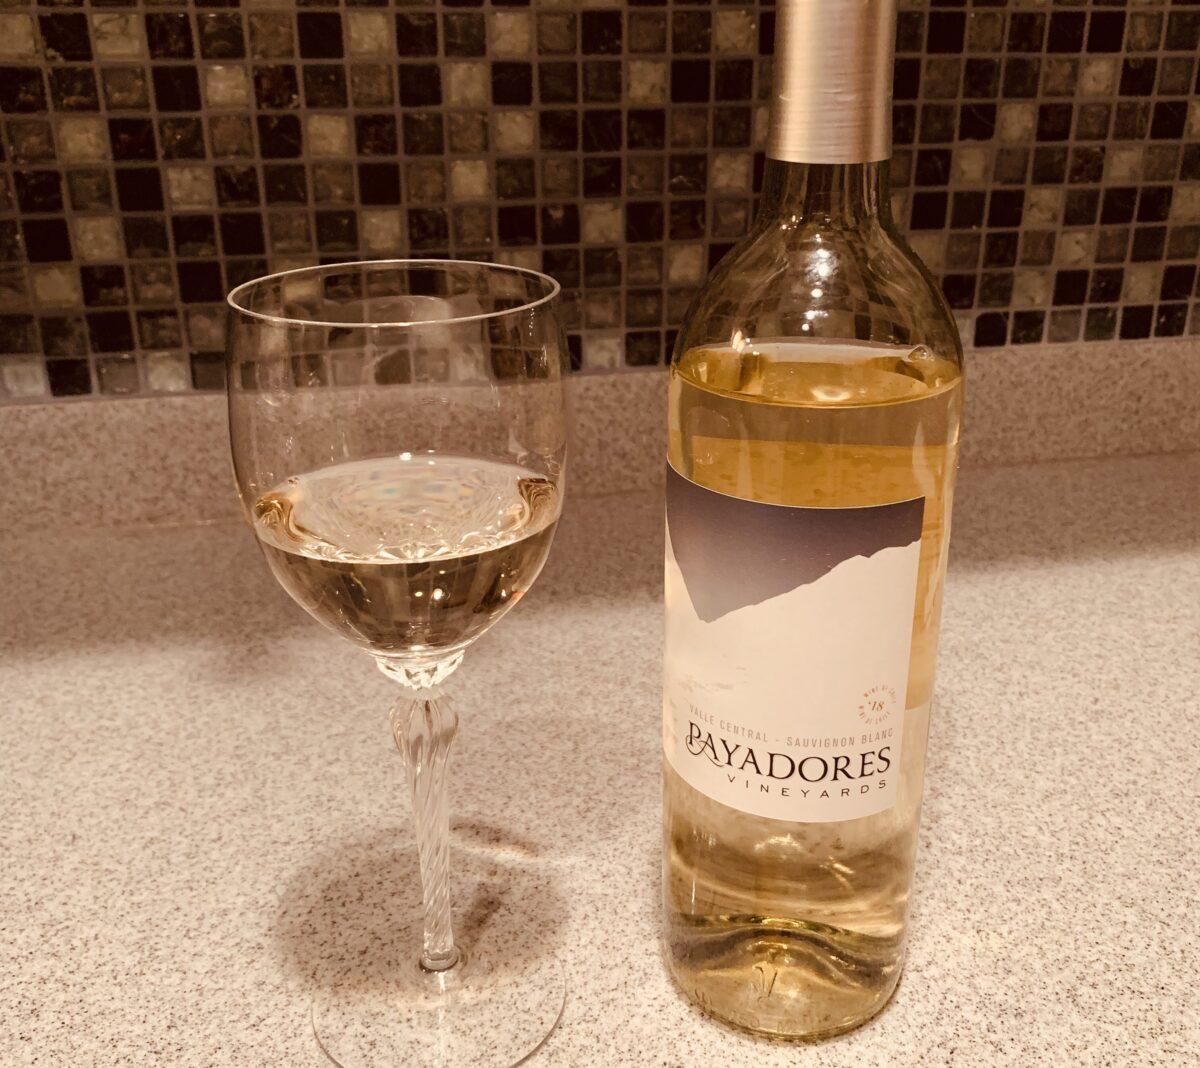 Wine Review – Payadores